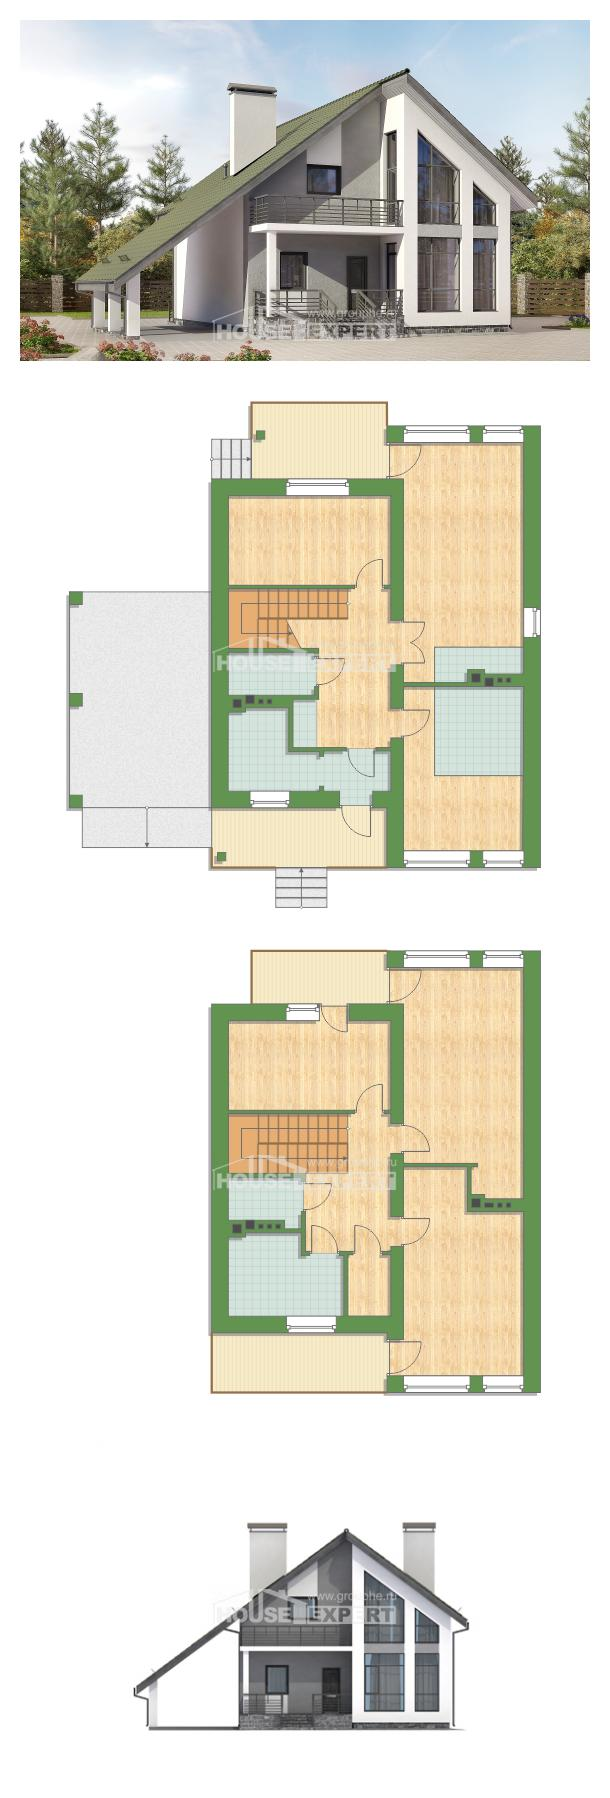 Проект дома 170-009-Л   House Expert